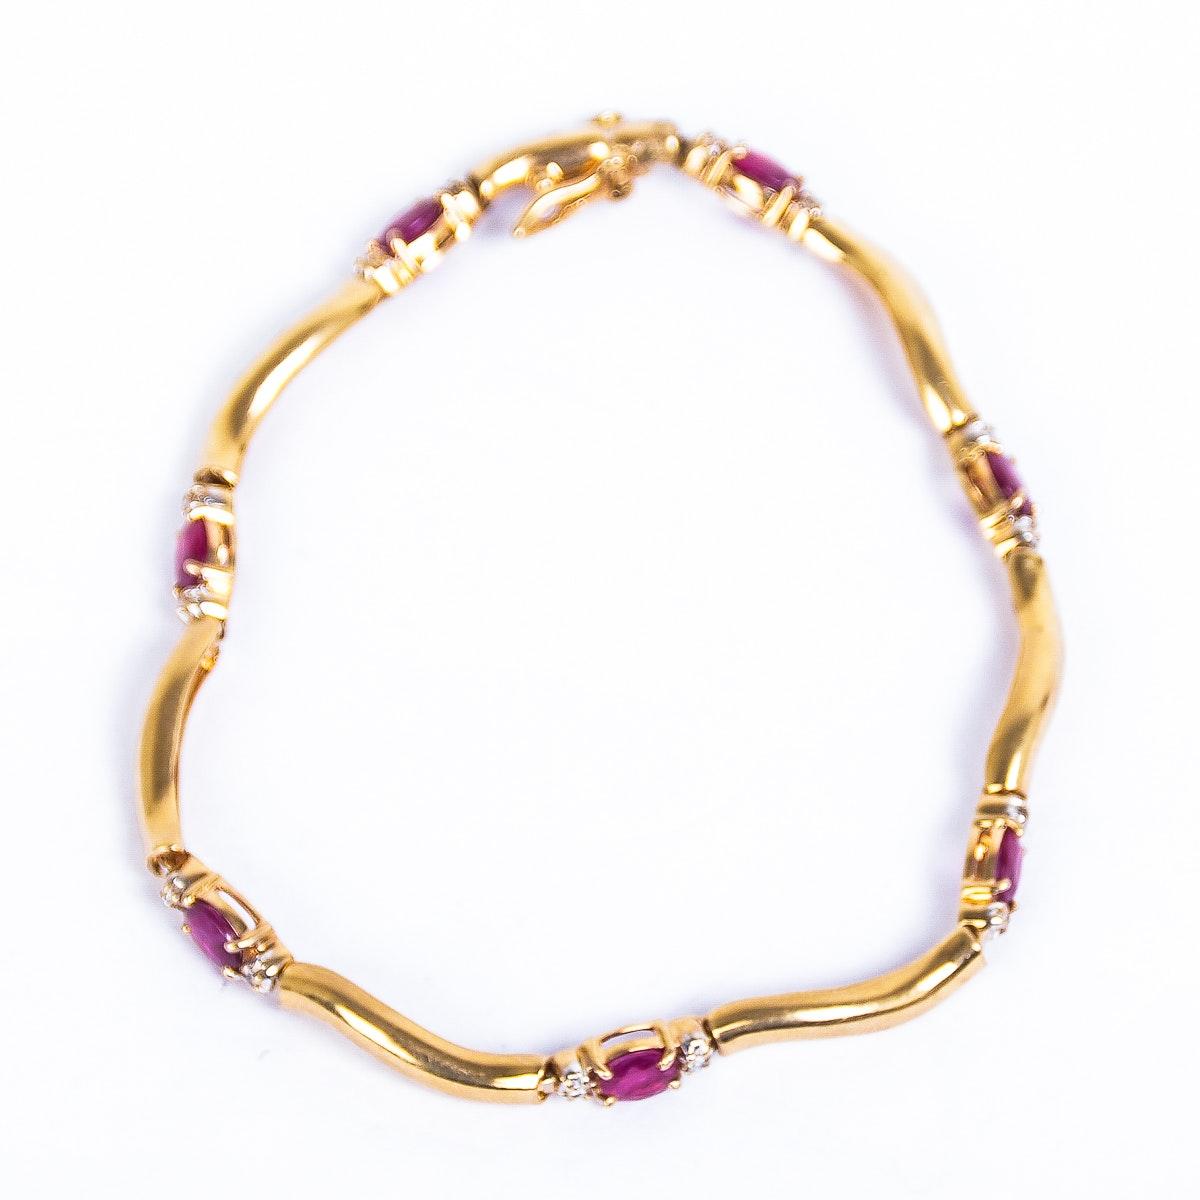 14K Yellow Gold, Ruby and Diamond Link Bracelet